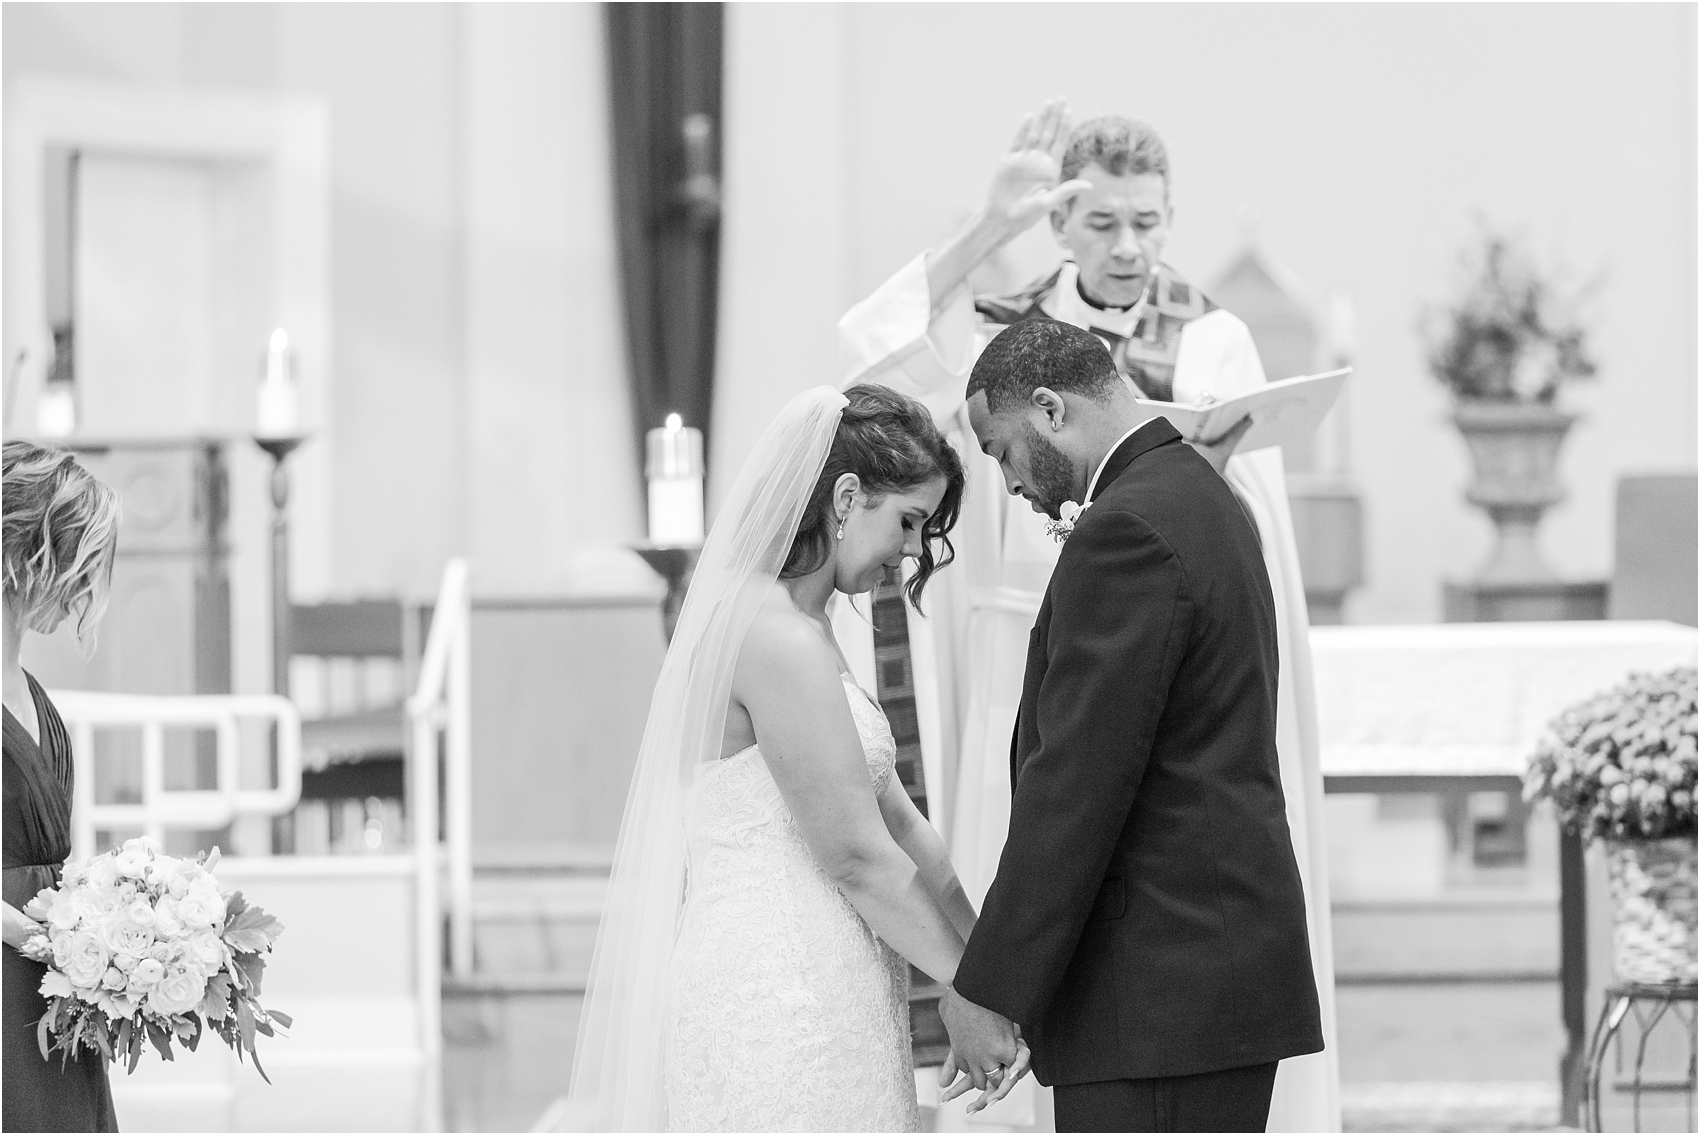 elegant-and-romantic-fall-wedding-photos-at-st-marys-catholic-church-in-monroe-michigan-by-courtney-carolyn-photography_0025.jpg